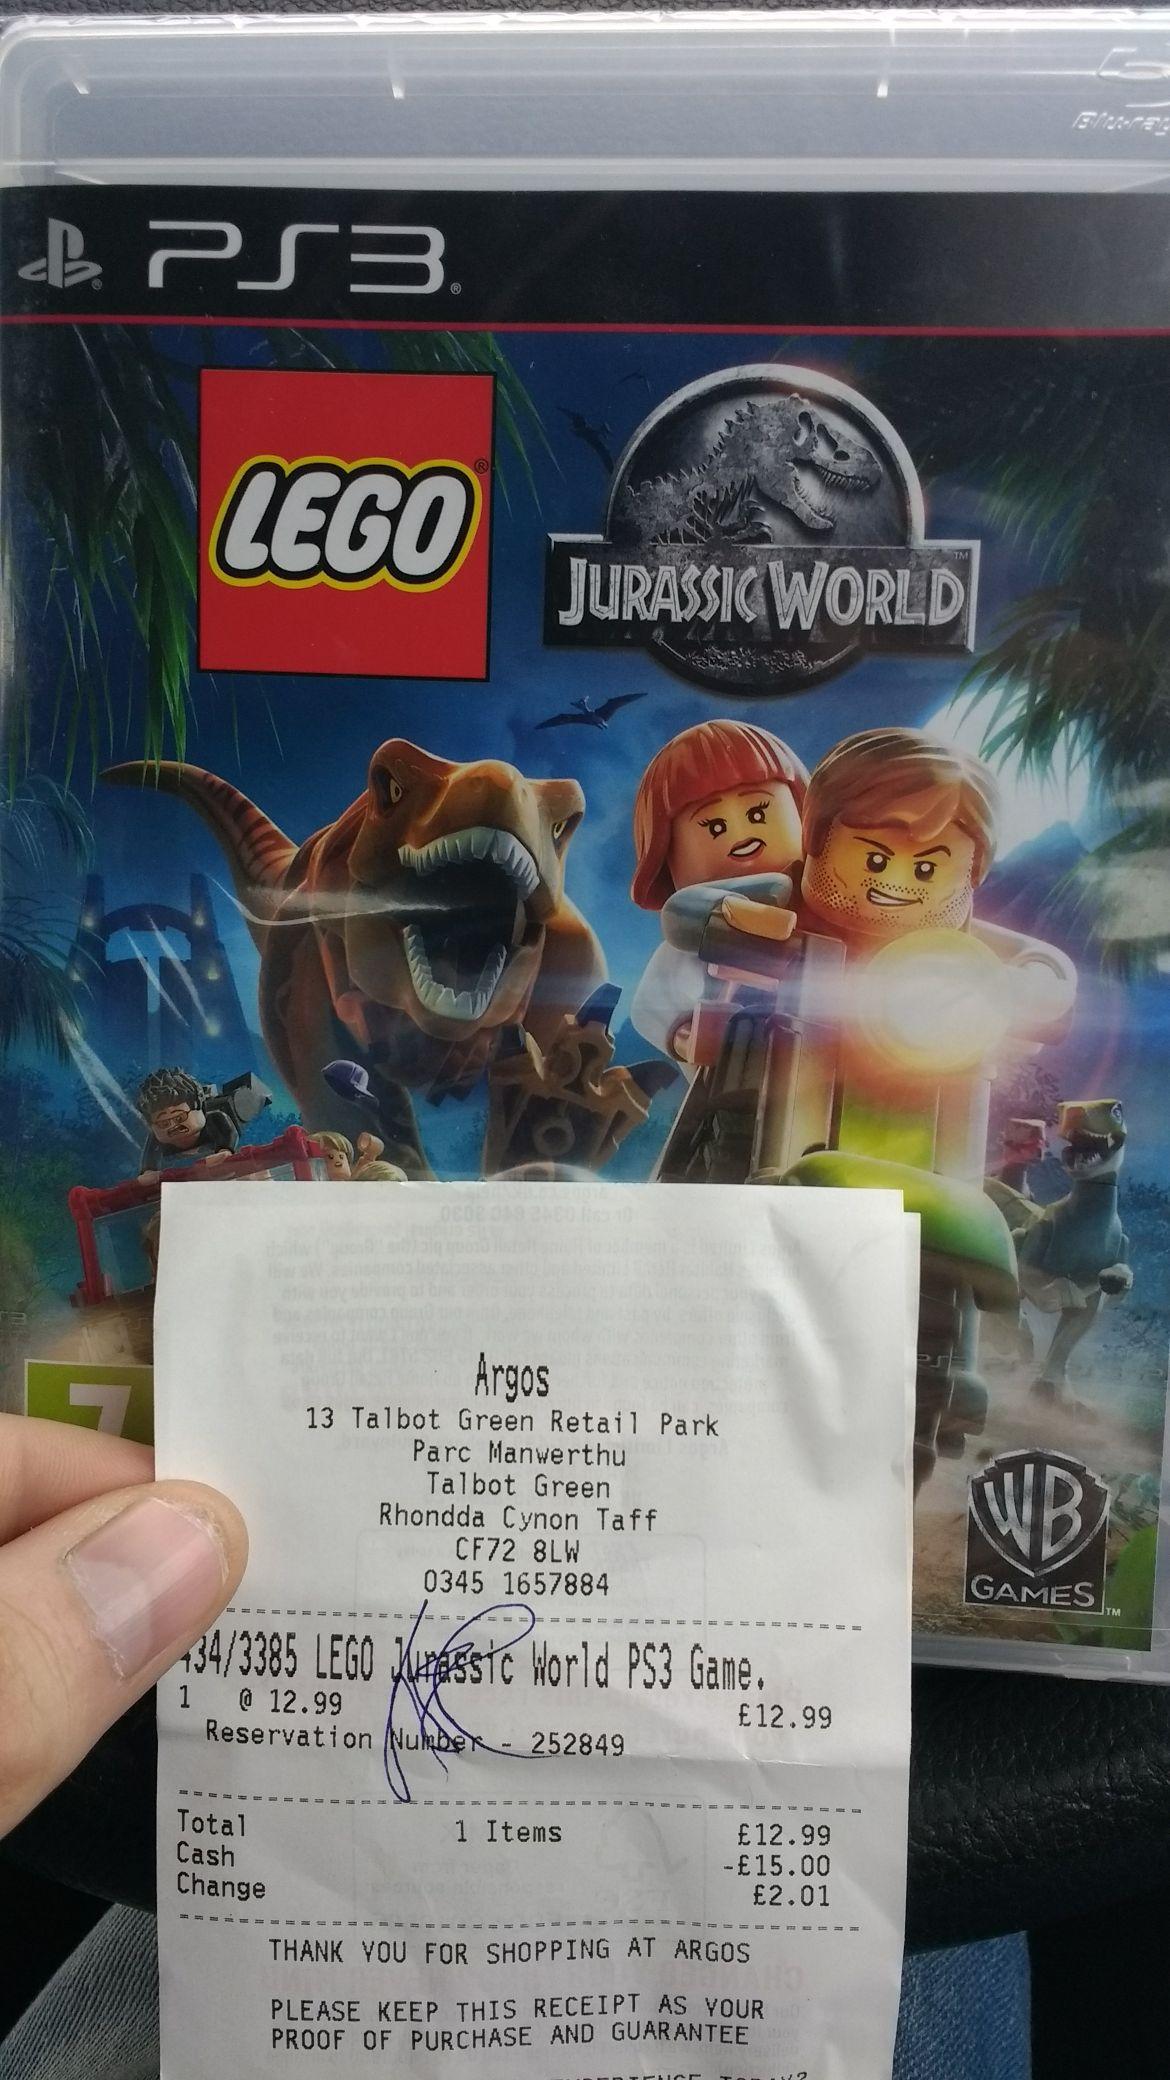 Lego Jurassic world for ps3 £12.99 @ Argos